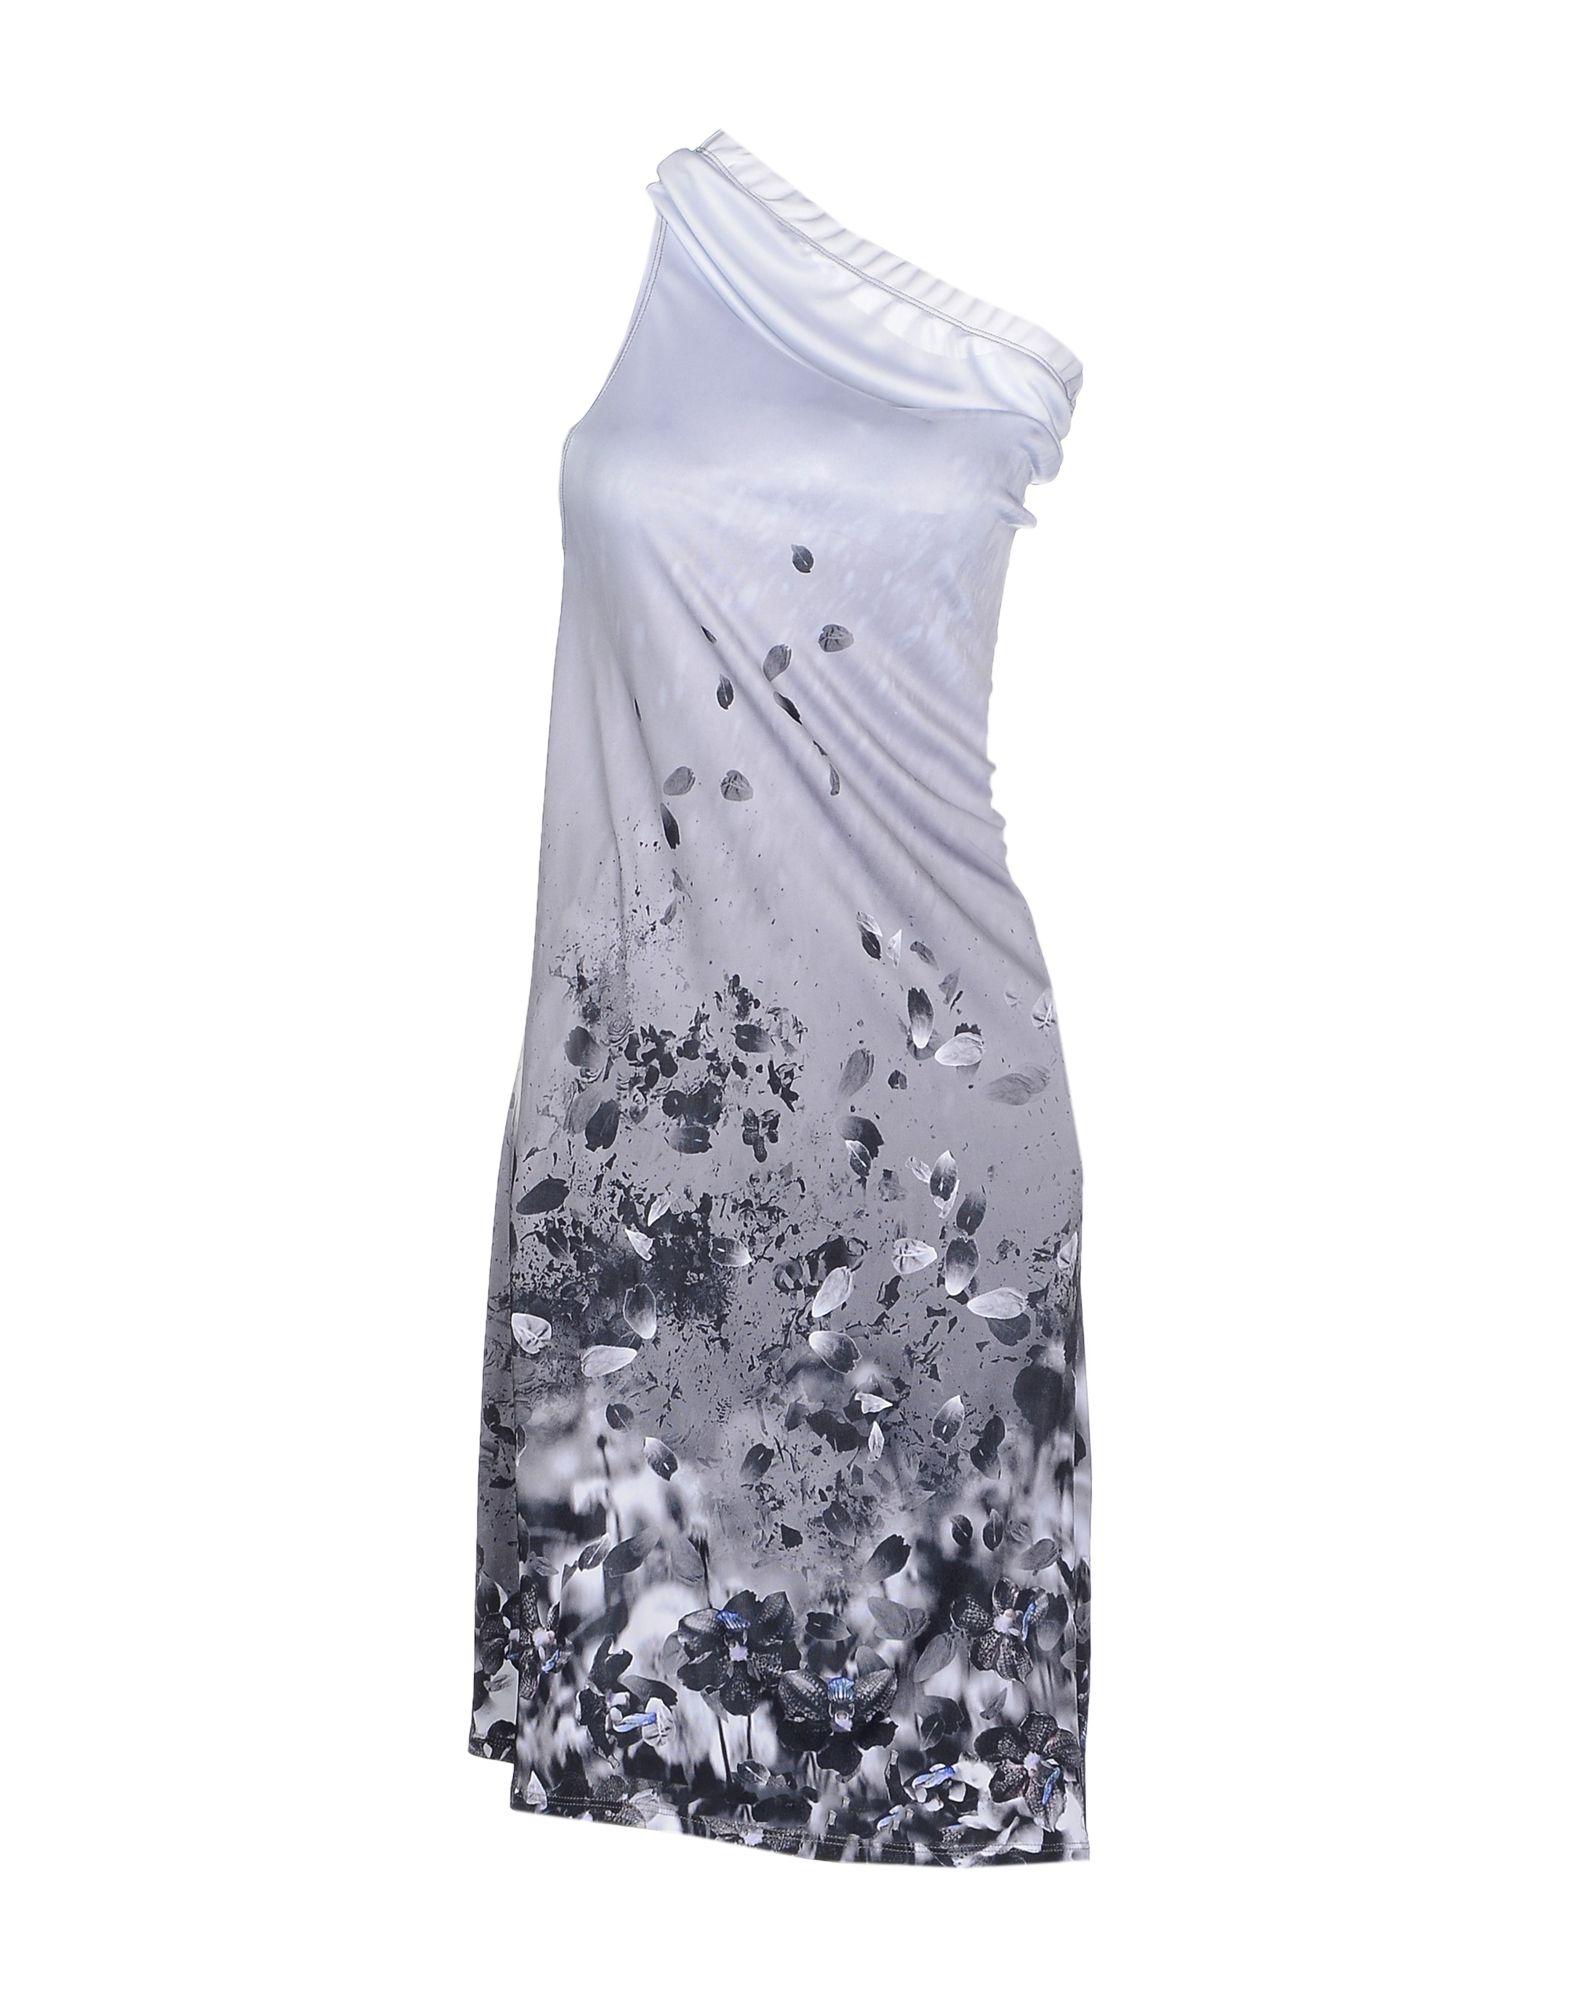 AMINAKA WILMONT Платье длиной 3/4 lisa corti платье длиной 3 4